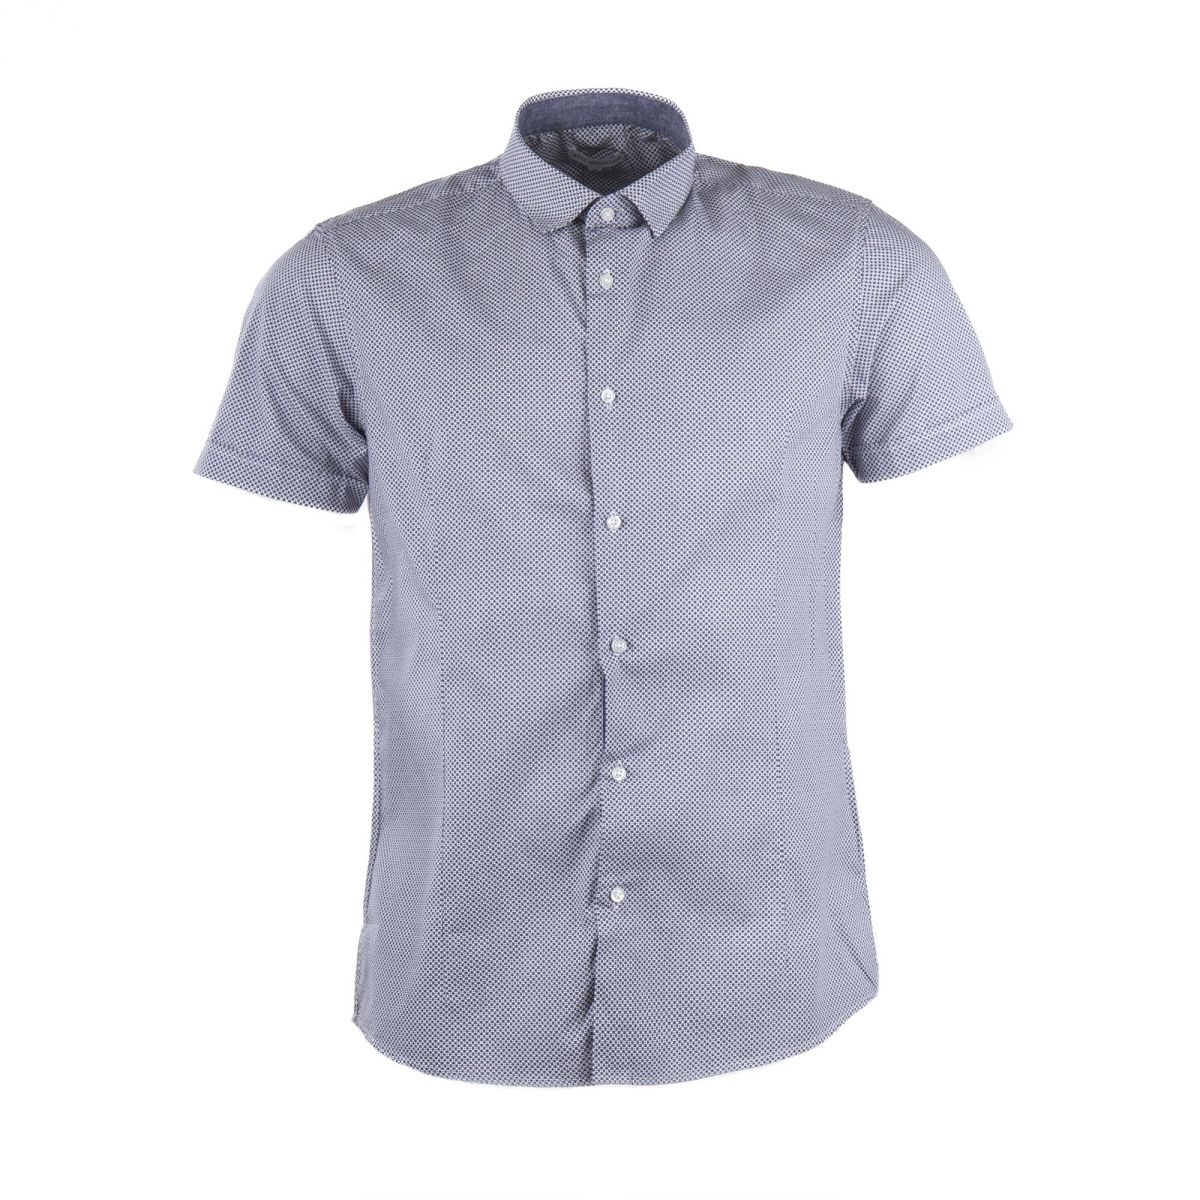 Lot chemise manches courtes BEST MOUNTAIN + bermuda RED SOUL homme à cad2a59fa820